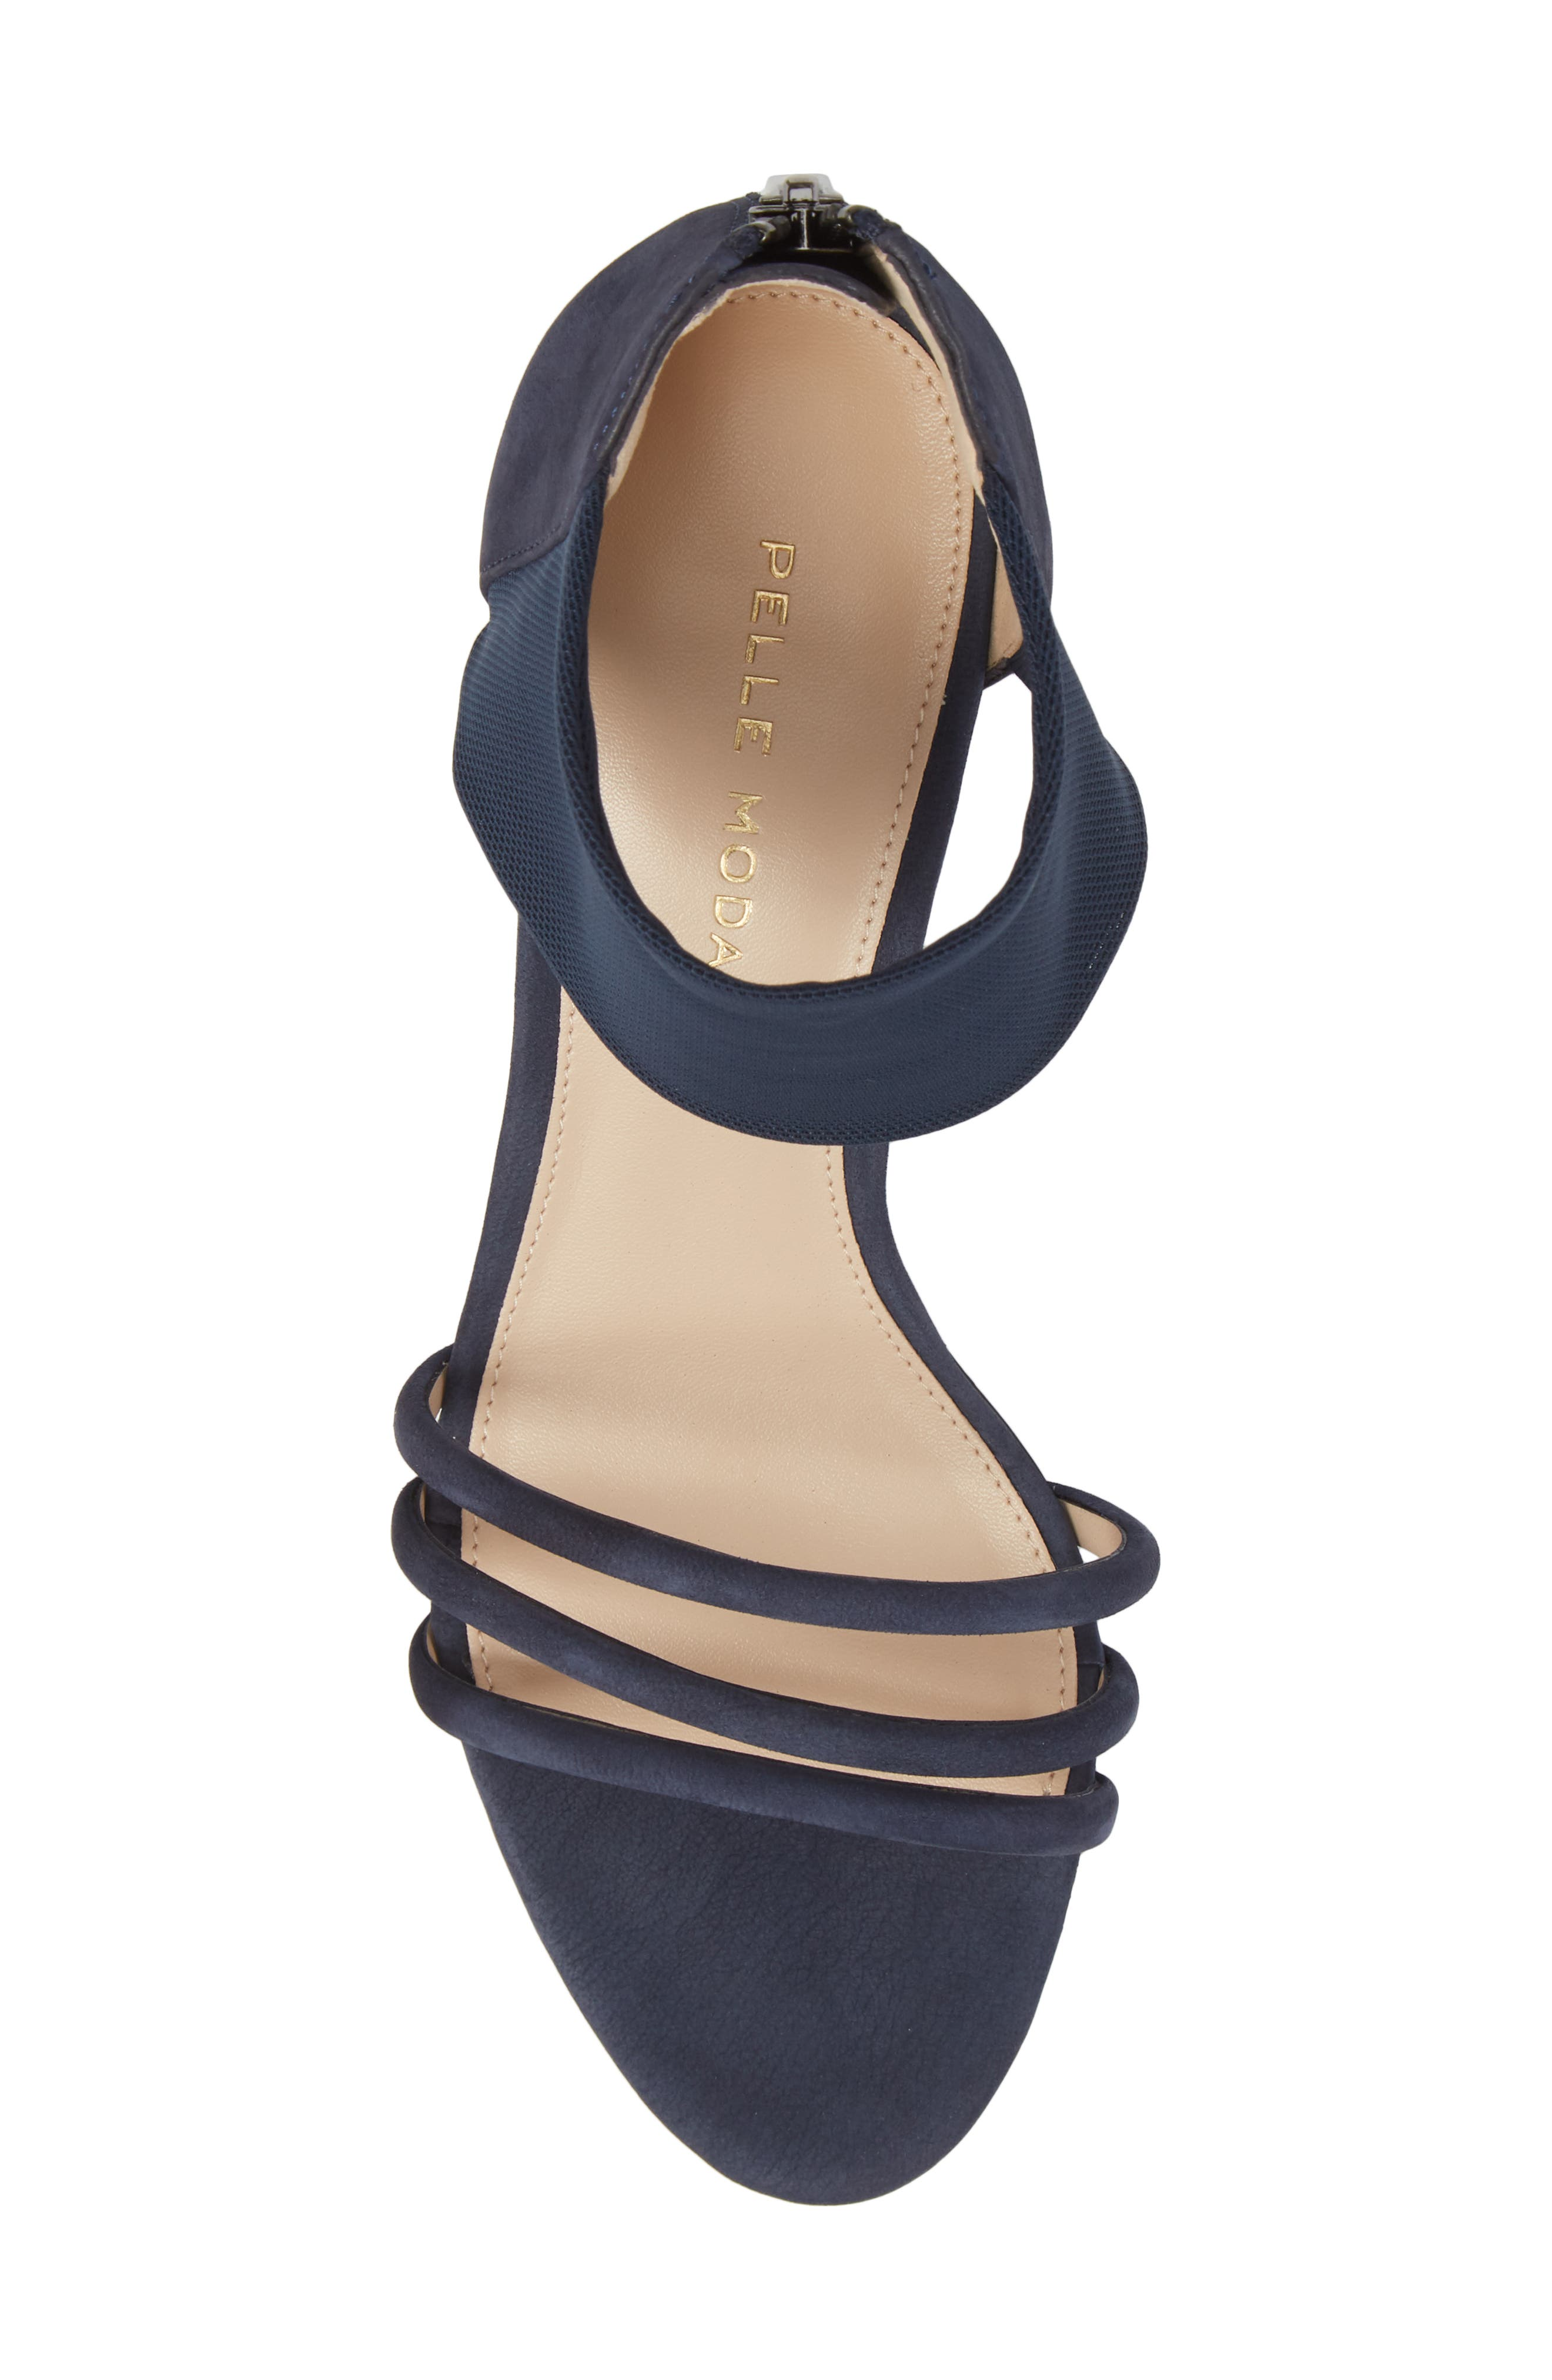 Berri Ankle Cuff Sandal,                             Alternate thumbnail 15, color,